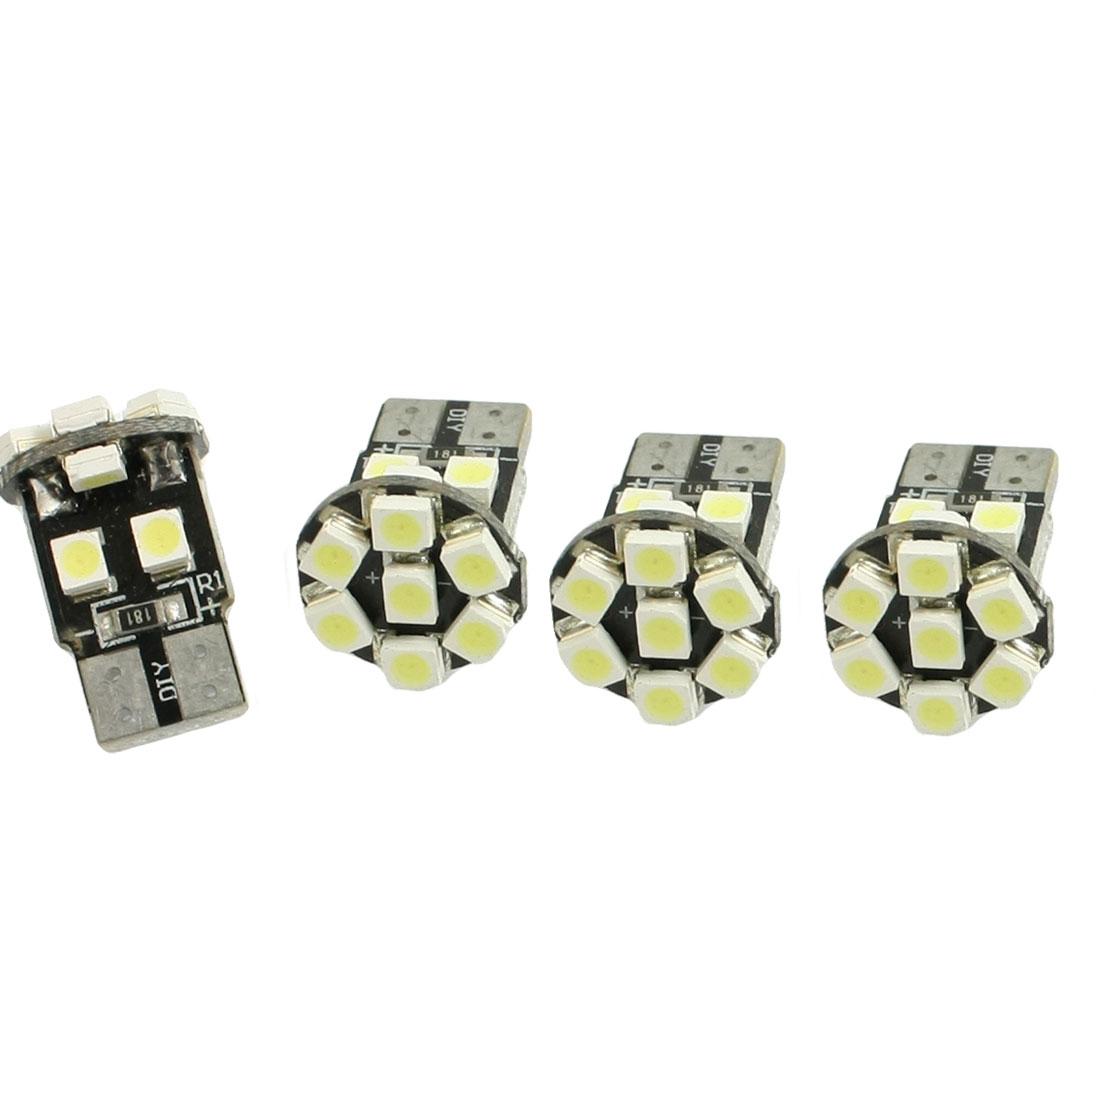 4 Pcs T10 White 1210 3528 13 SMD LED Car Side Wedge Light Lamp